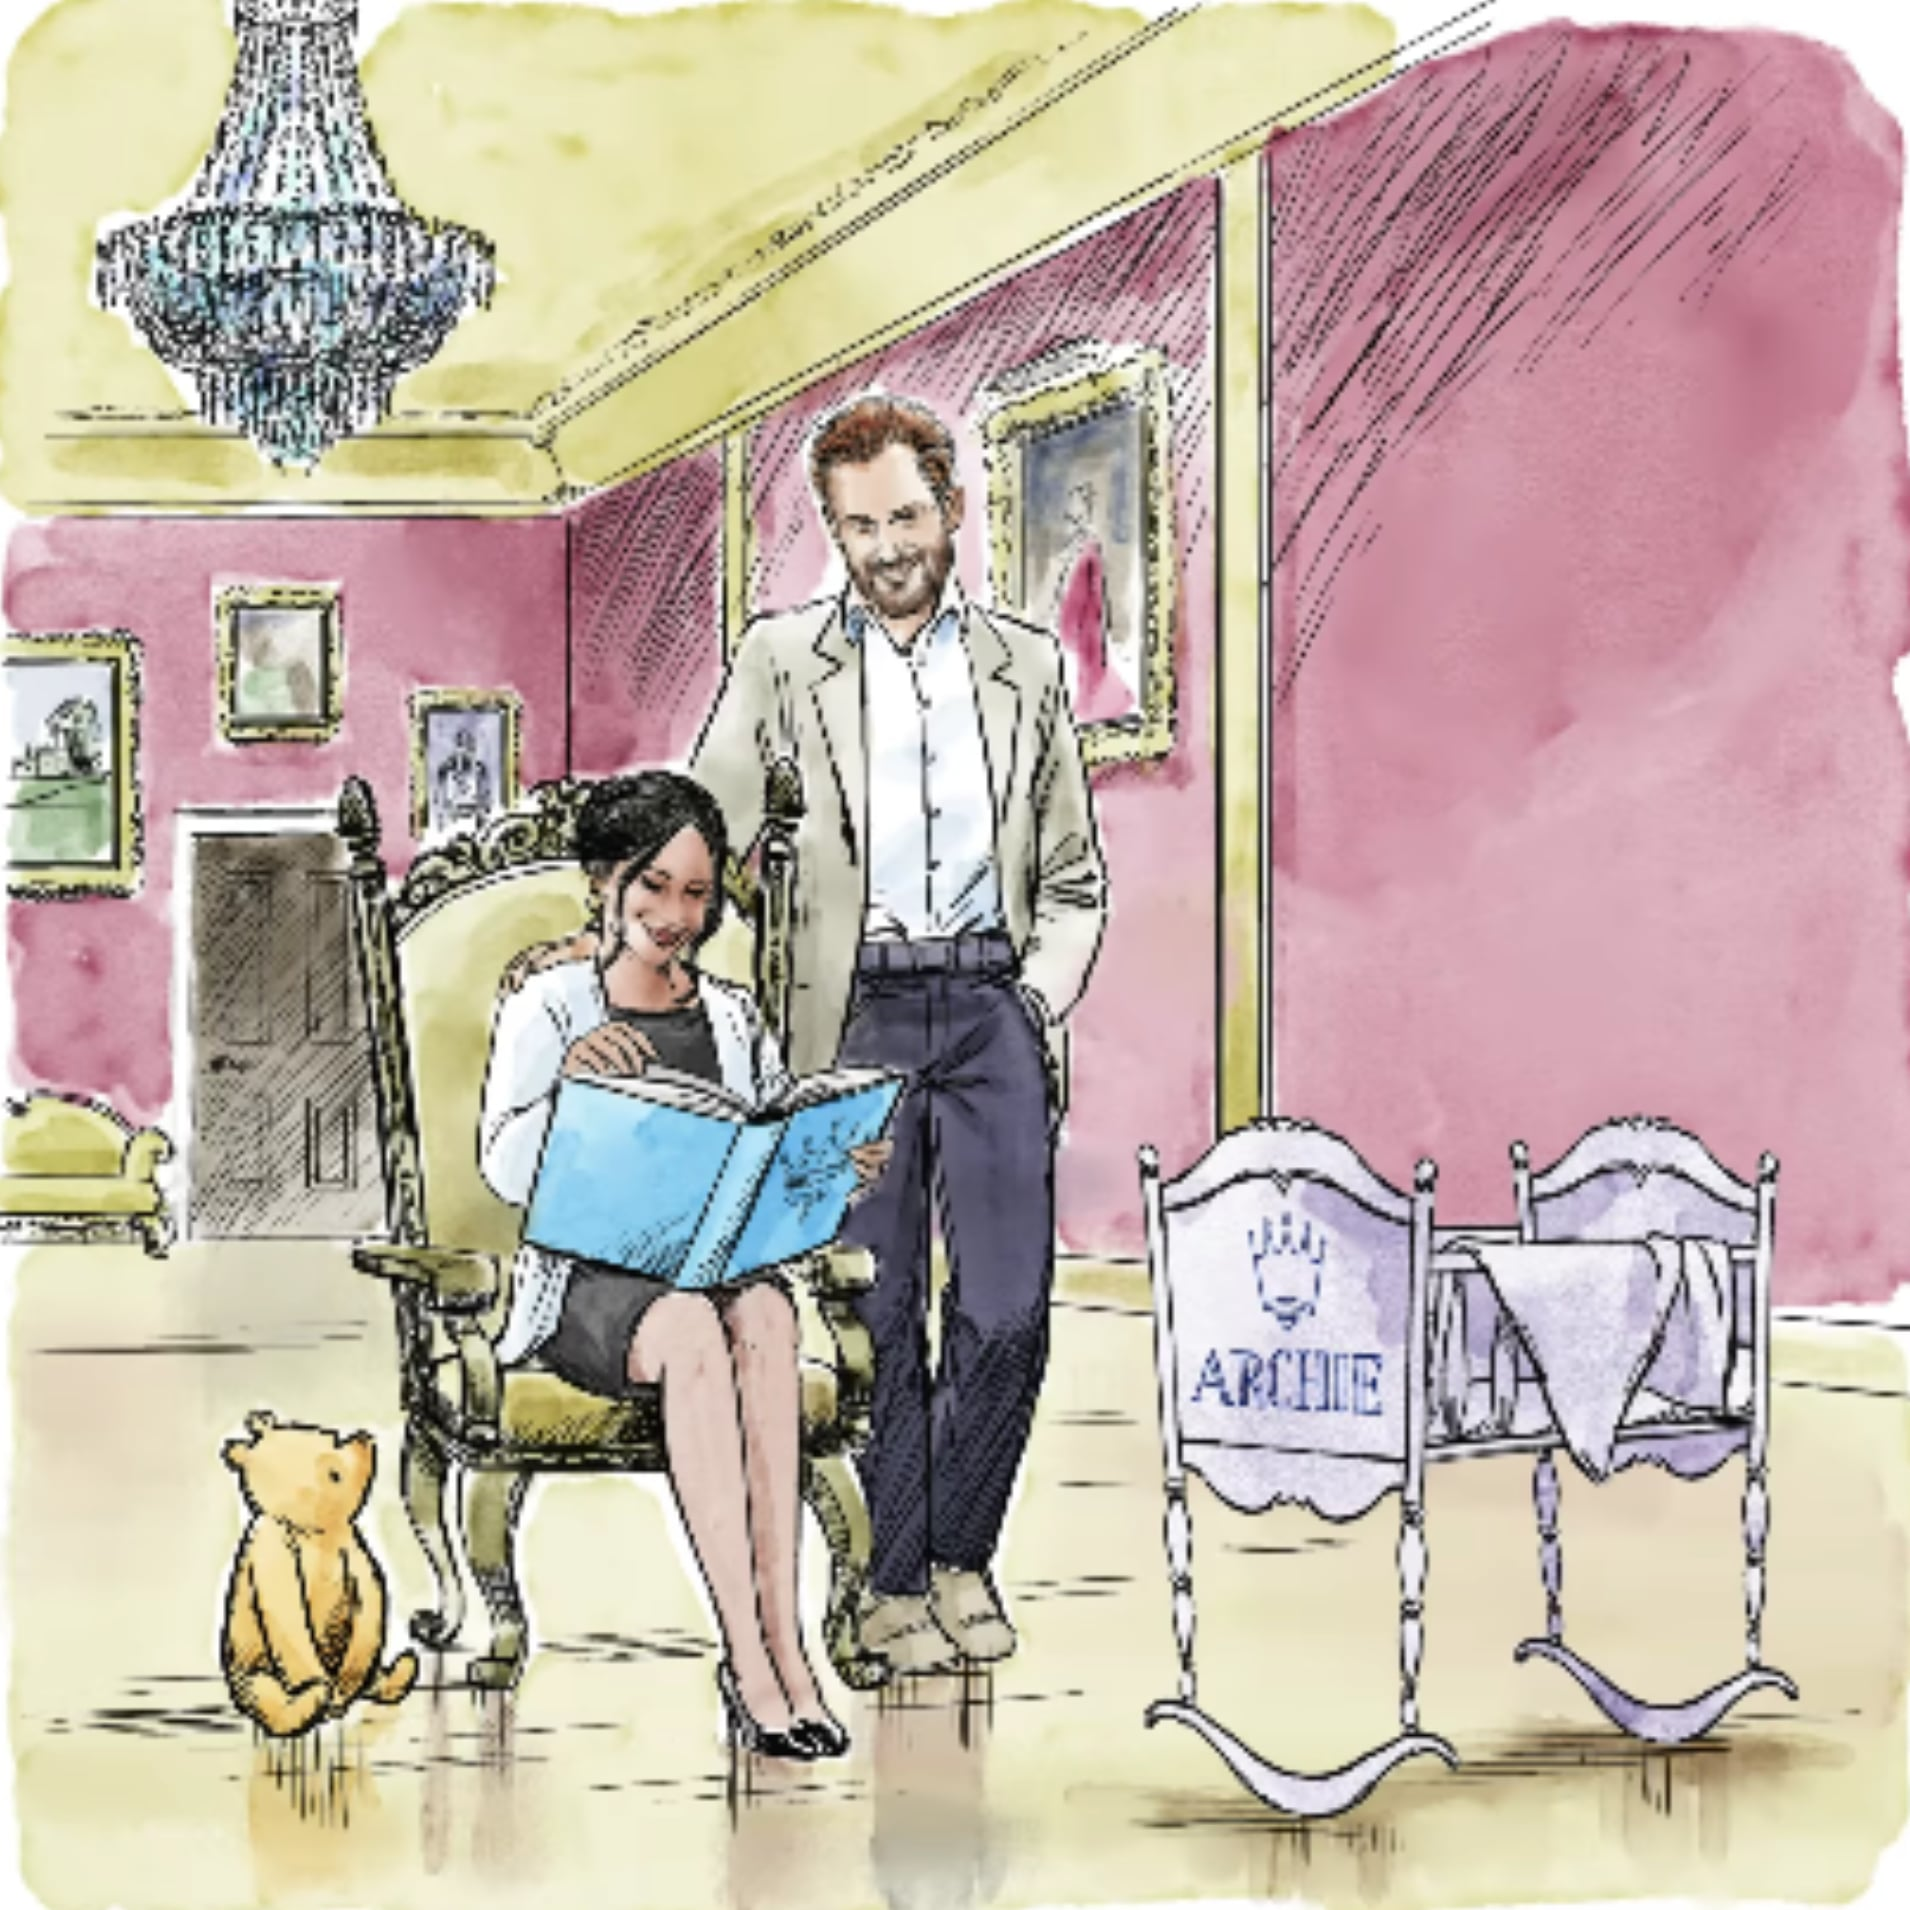 Disney Winnie the Pooh Illustration For Archie   POPSUGAR UK Parenting